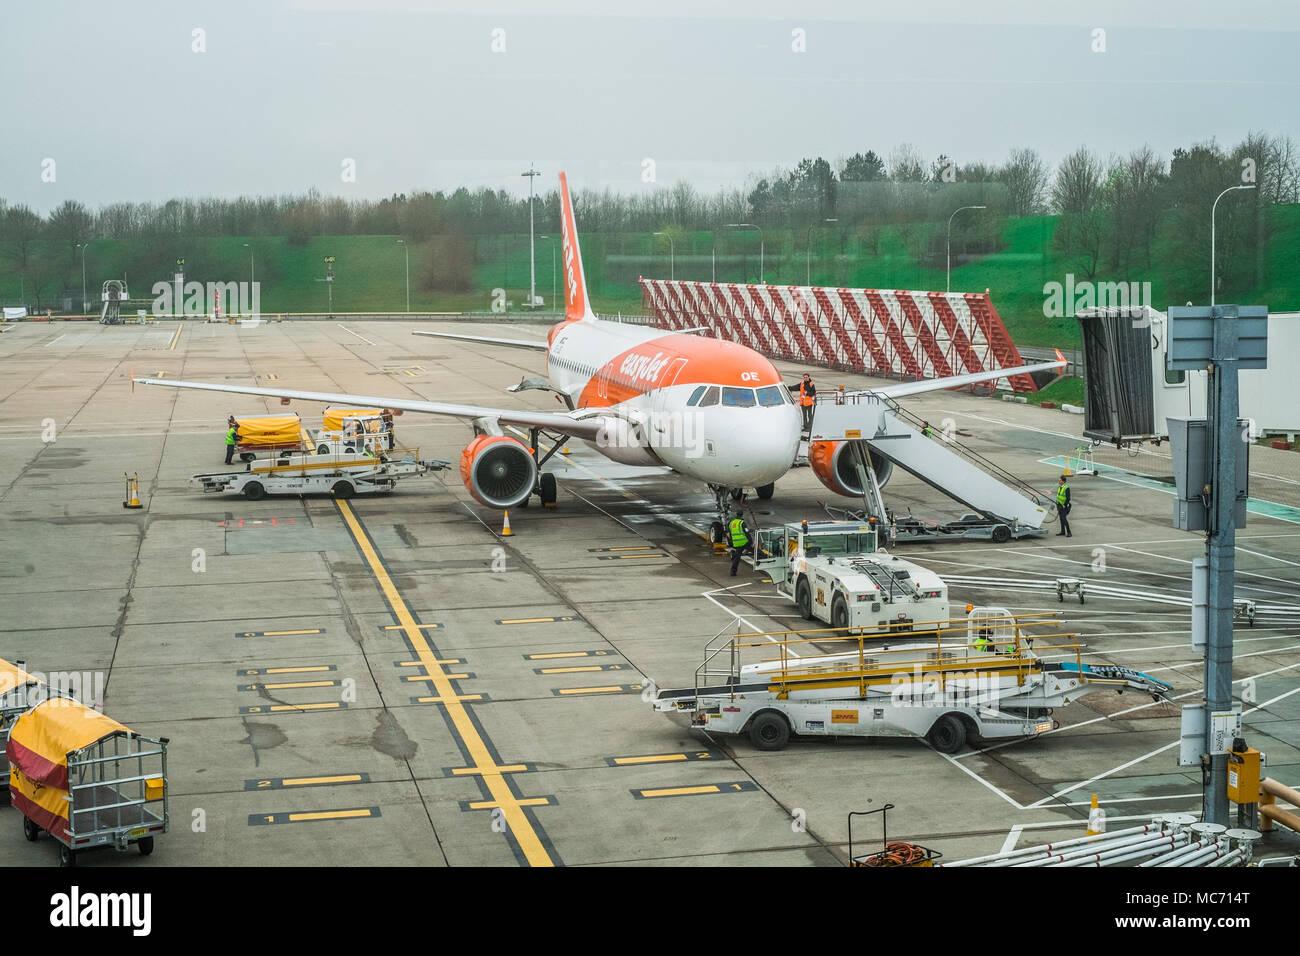 Easy Jet passenger jet at  London Gatwick LGW - Stock Image